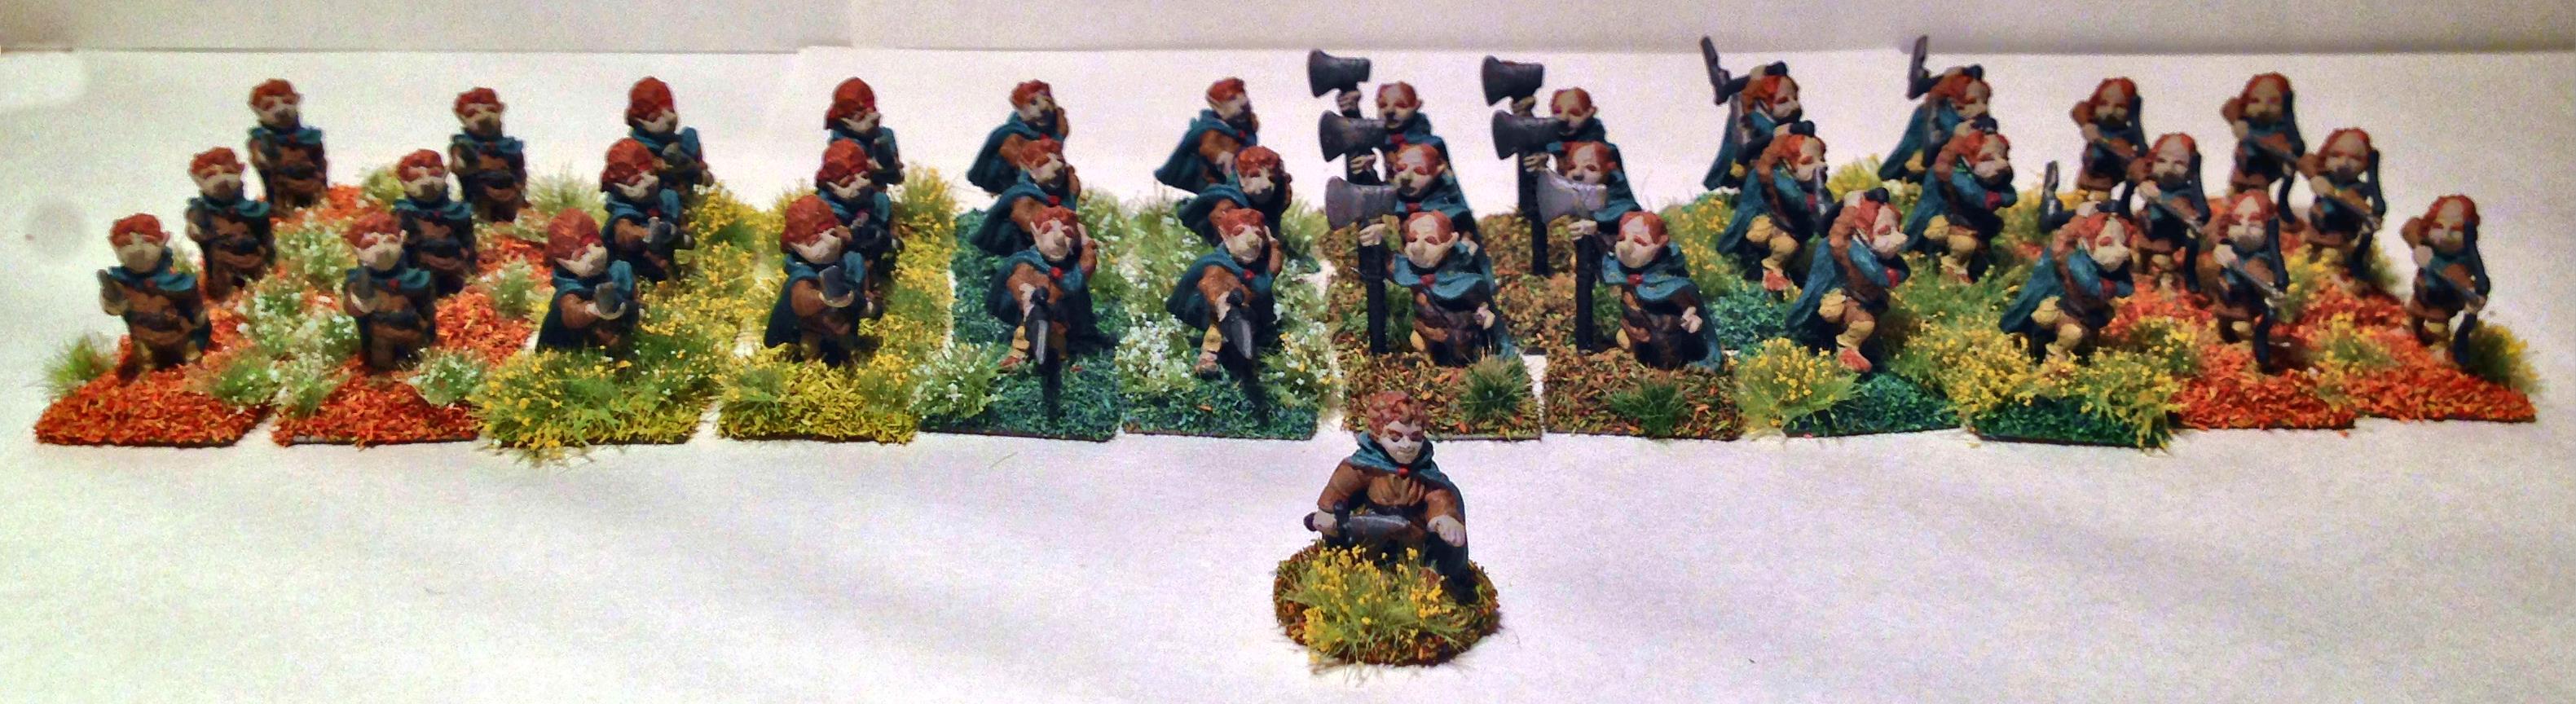 8-halfling-battalion